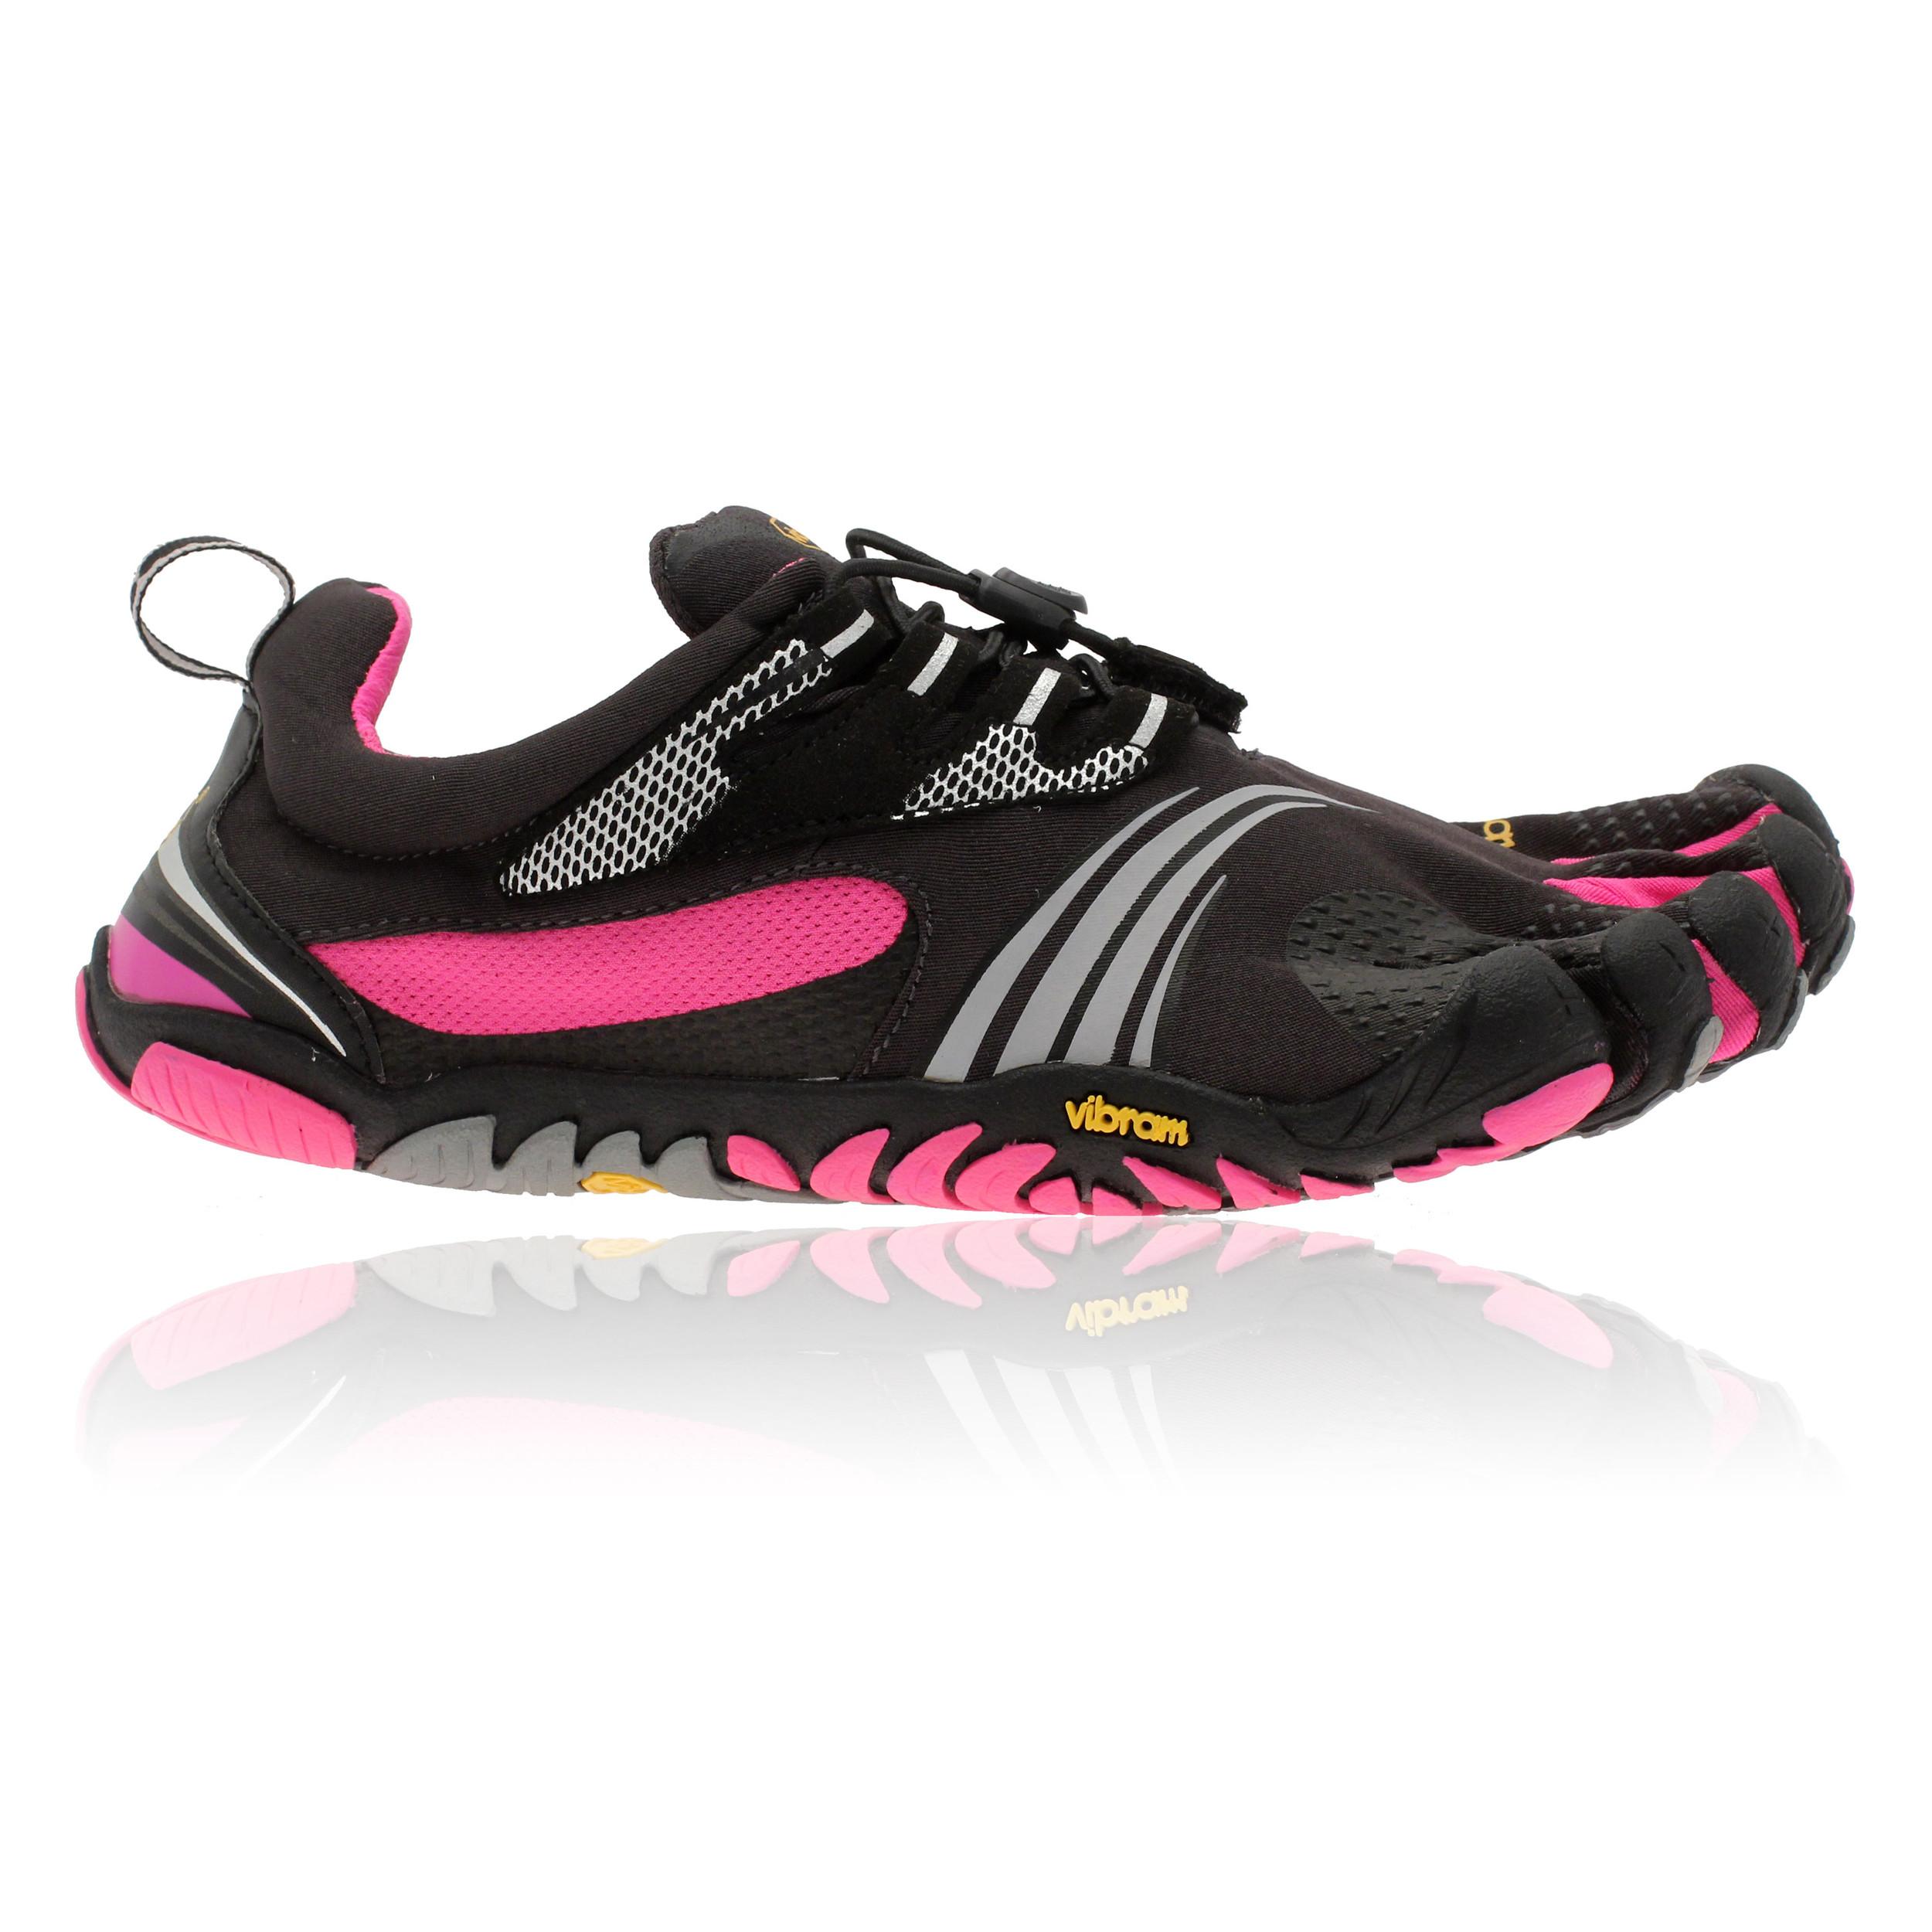 Tennis Shoes Sensory